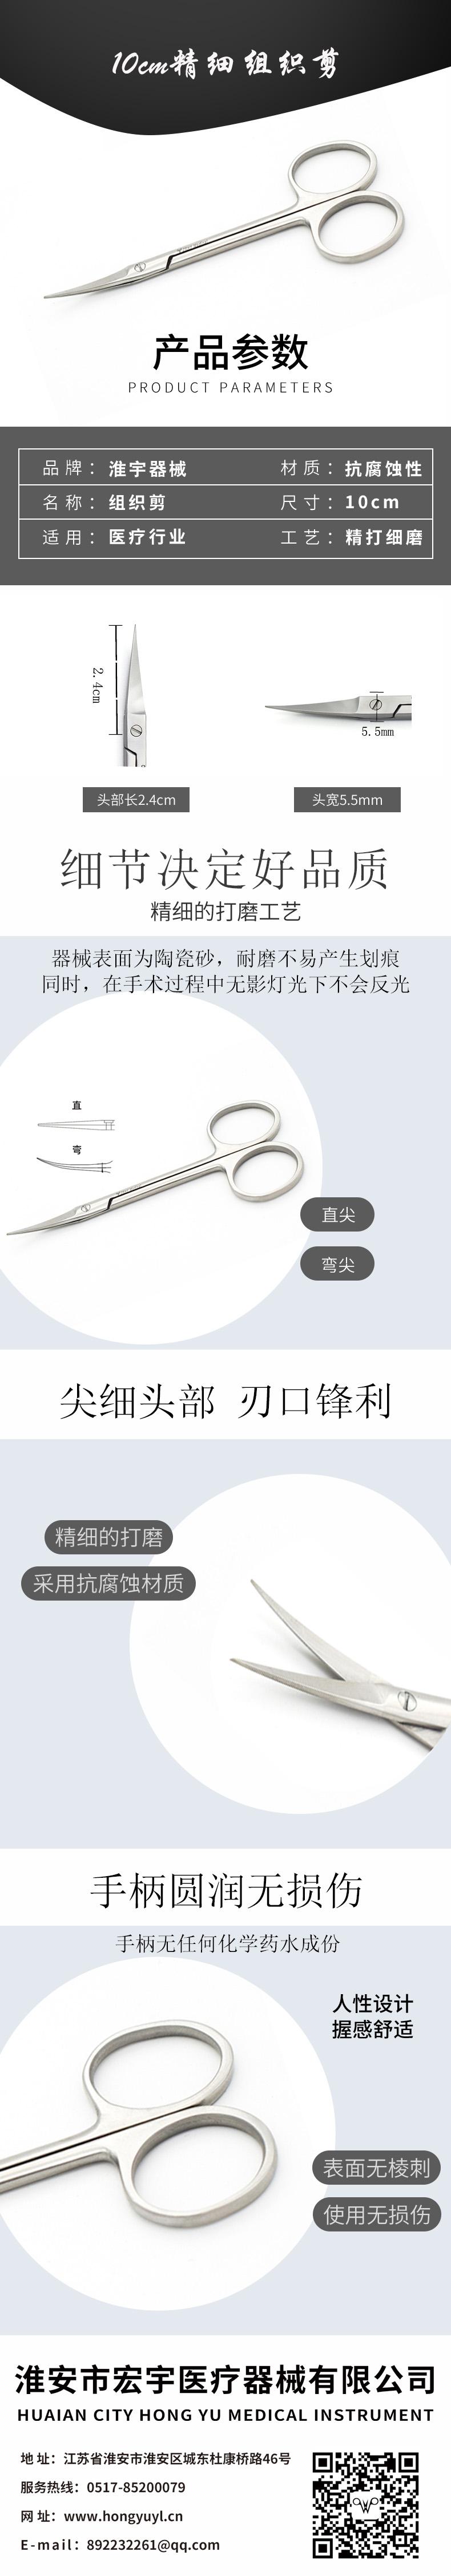 10cm精细组织剪.jpg